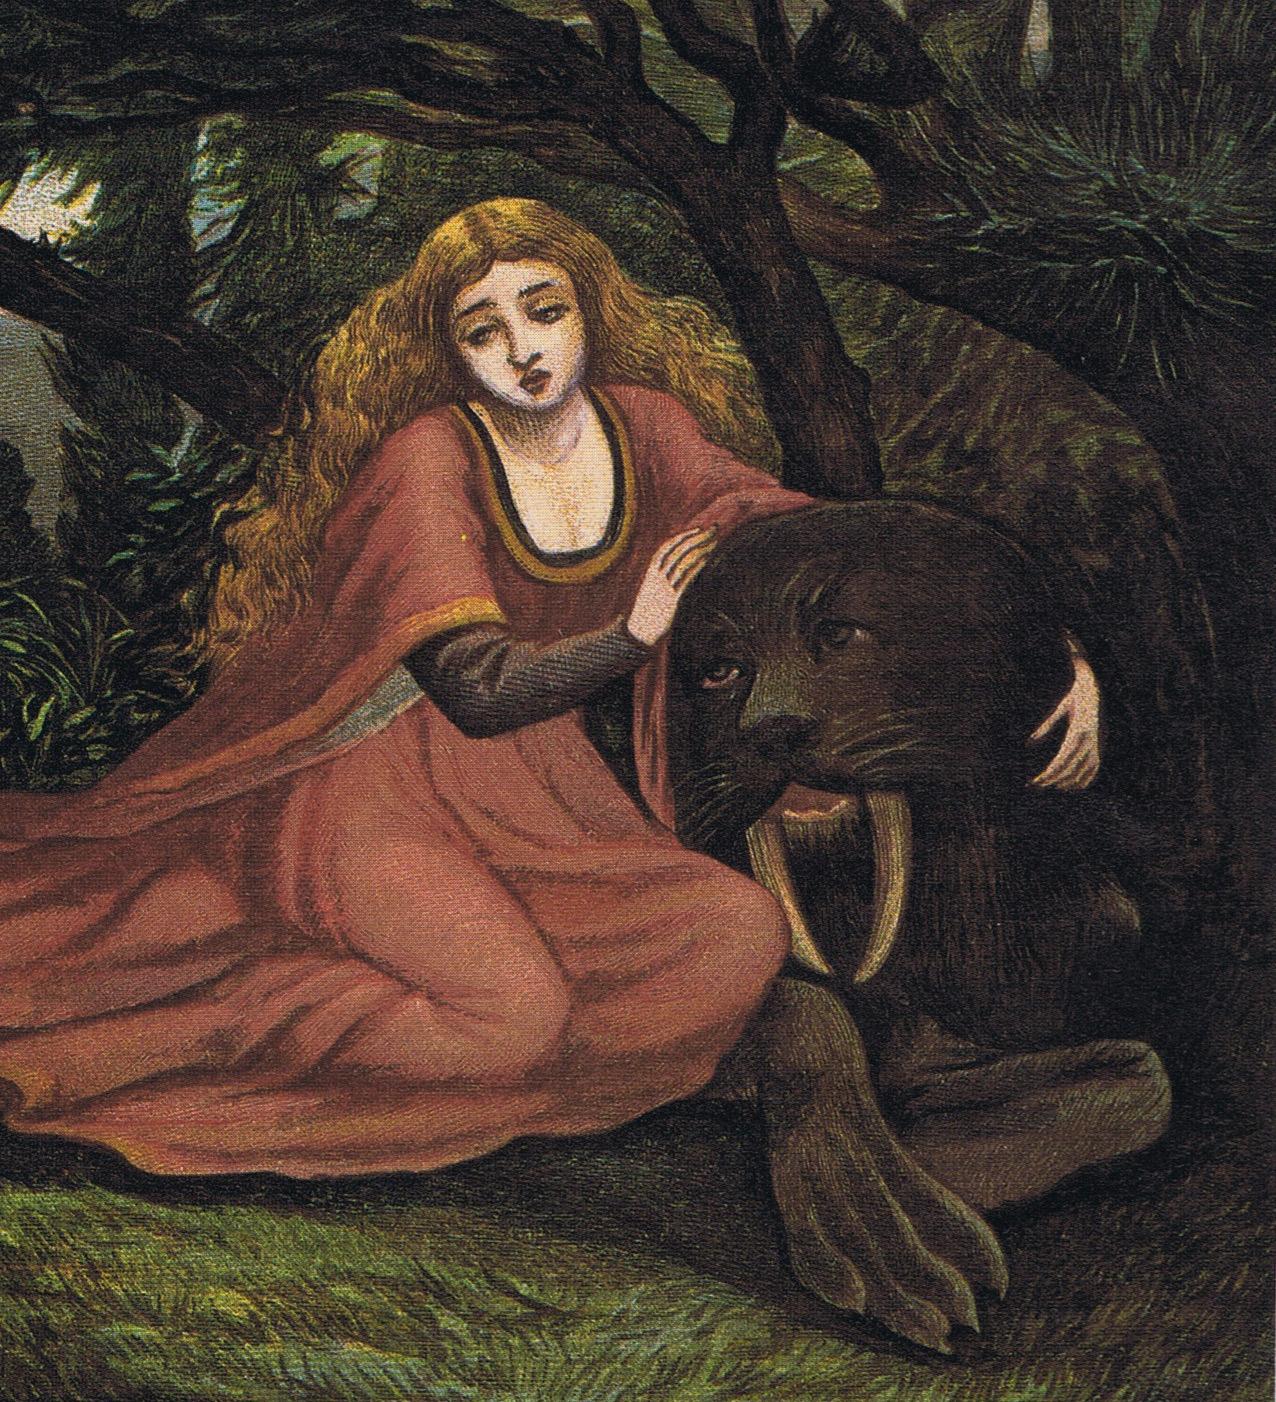 My School Essay On Beauty And Beast Kalinjicom aefcfbdcac Pi Essays